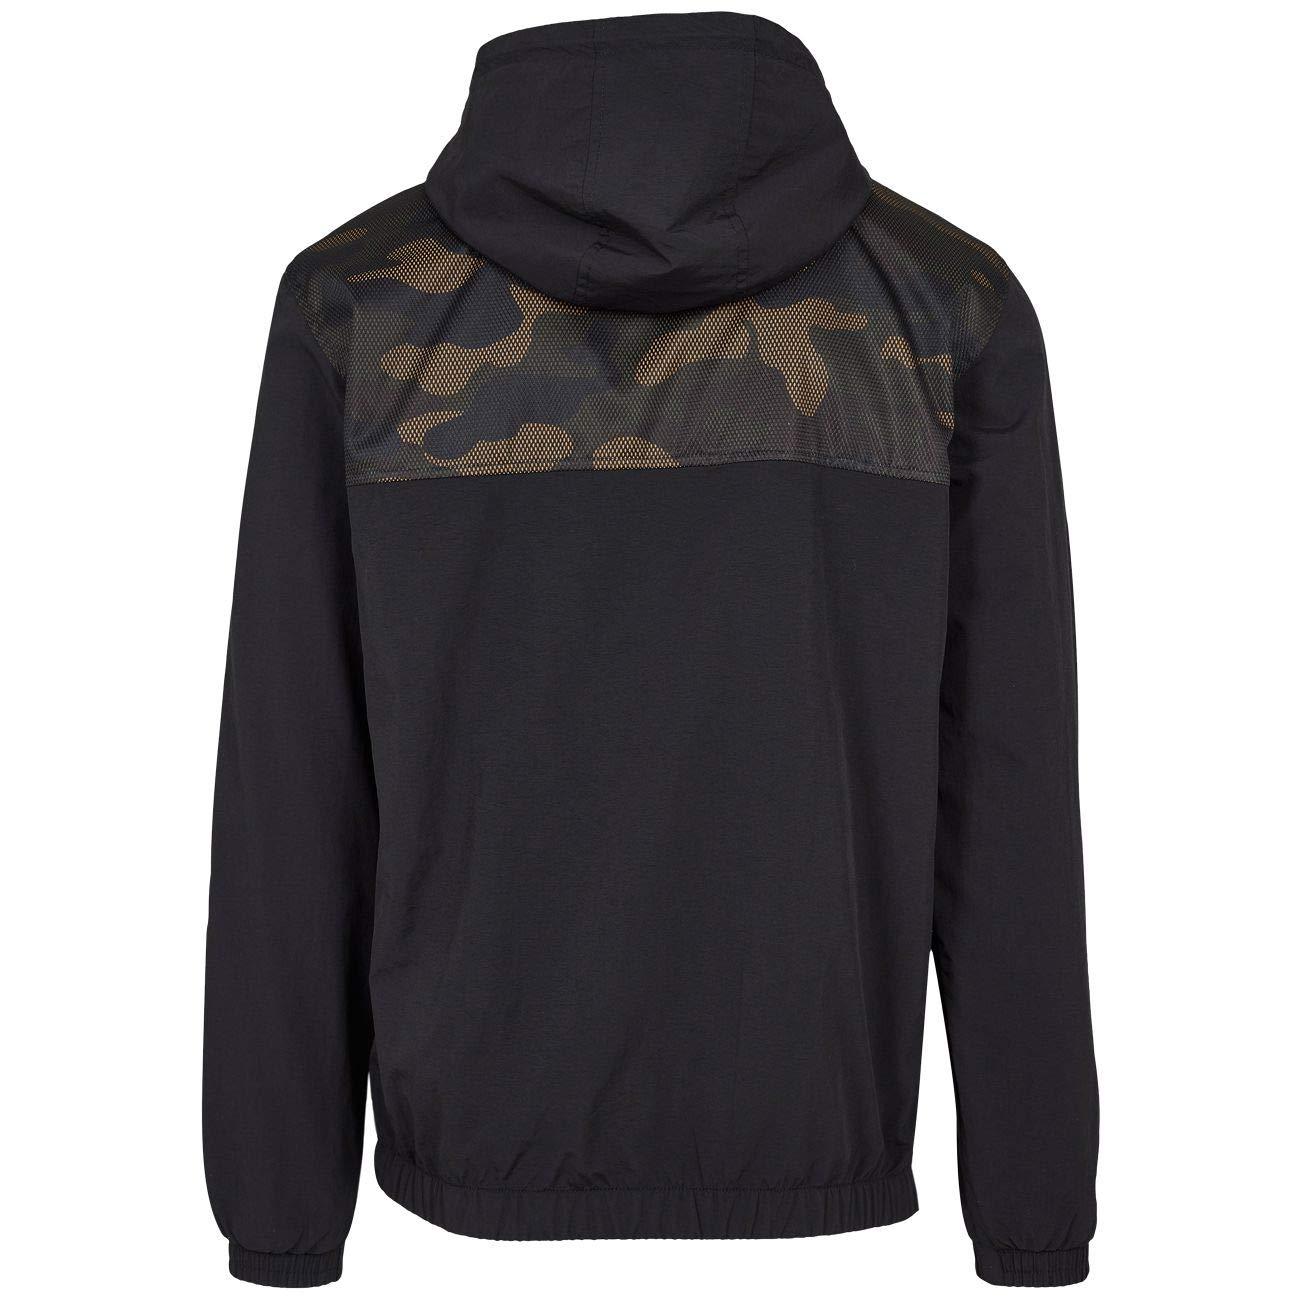 Spaß kostet Männer Windbreaker Zipper Jacke LA Familia Familia Familia Größe S - XXL B07JB95X4C Jacken Ausgezeichnete Funktion d842e5